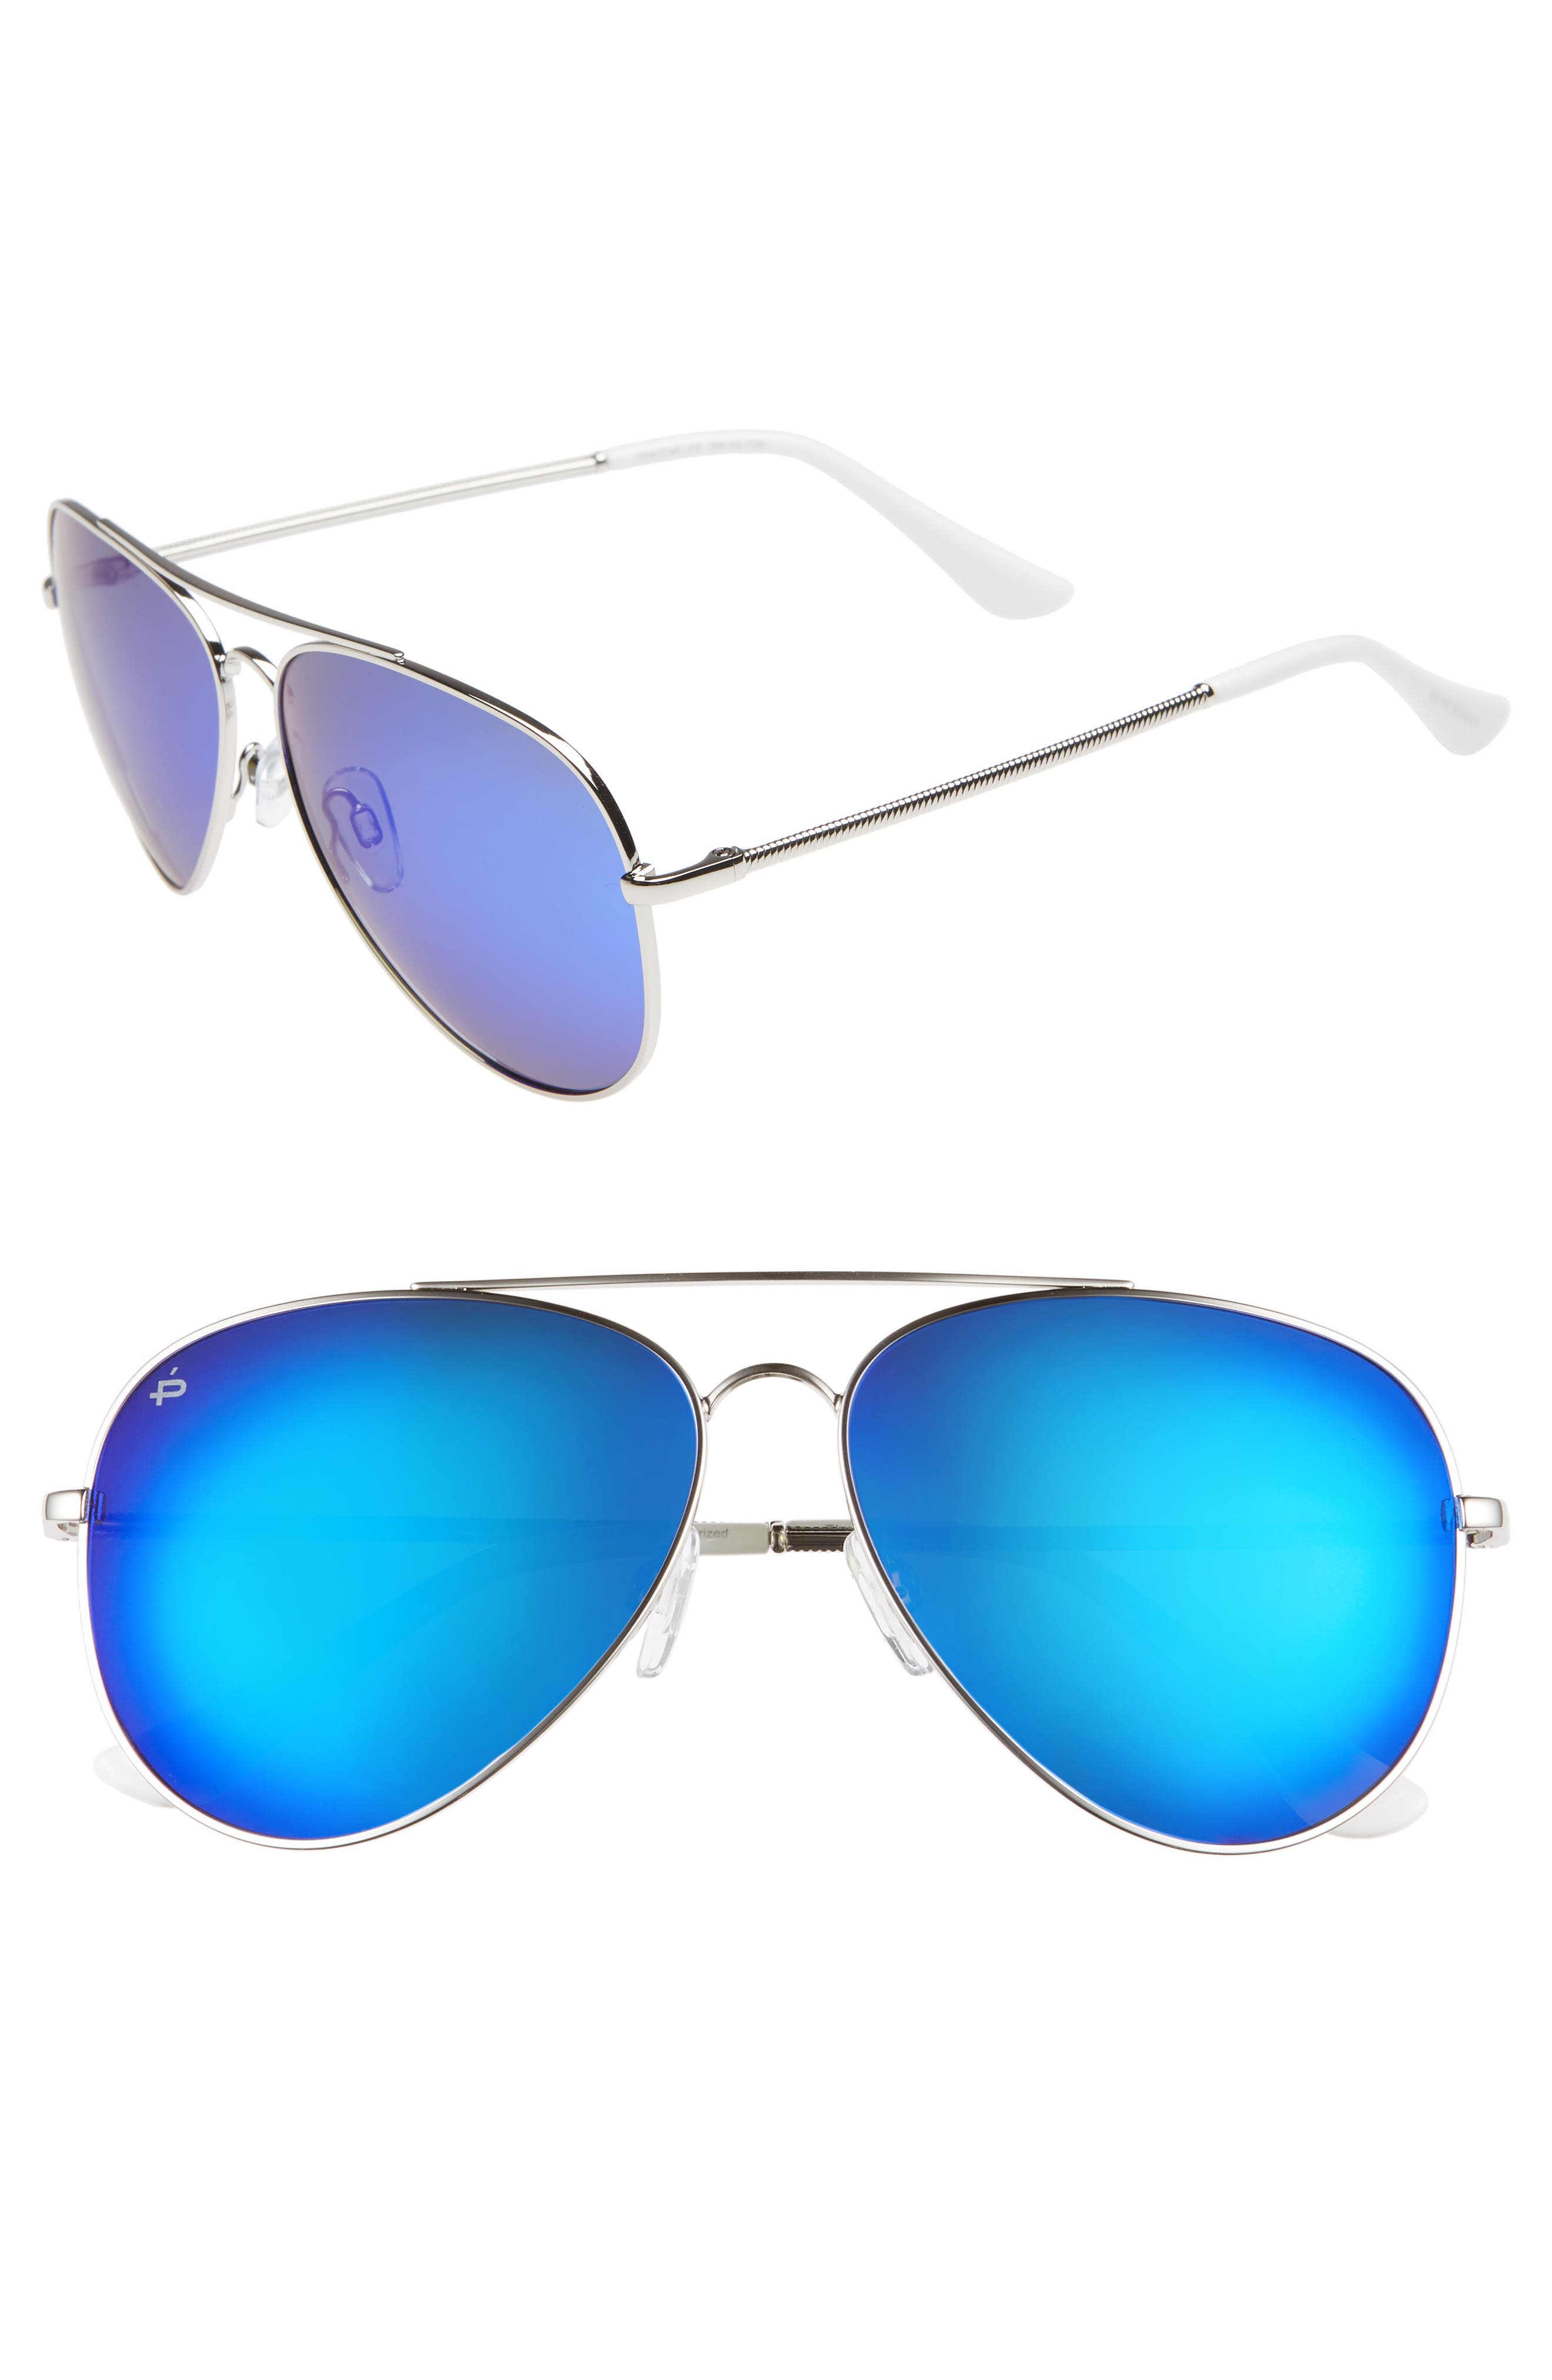 Privé Revaux The Cali Polarized 59mm Sunglasses,                         Main,                         color, NICKEL SILVER